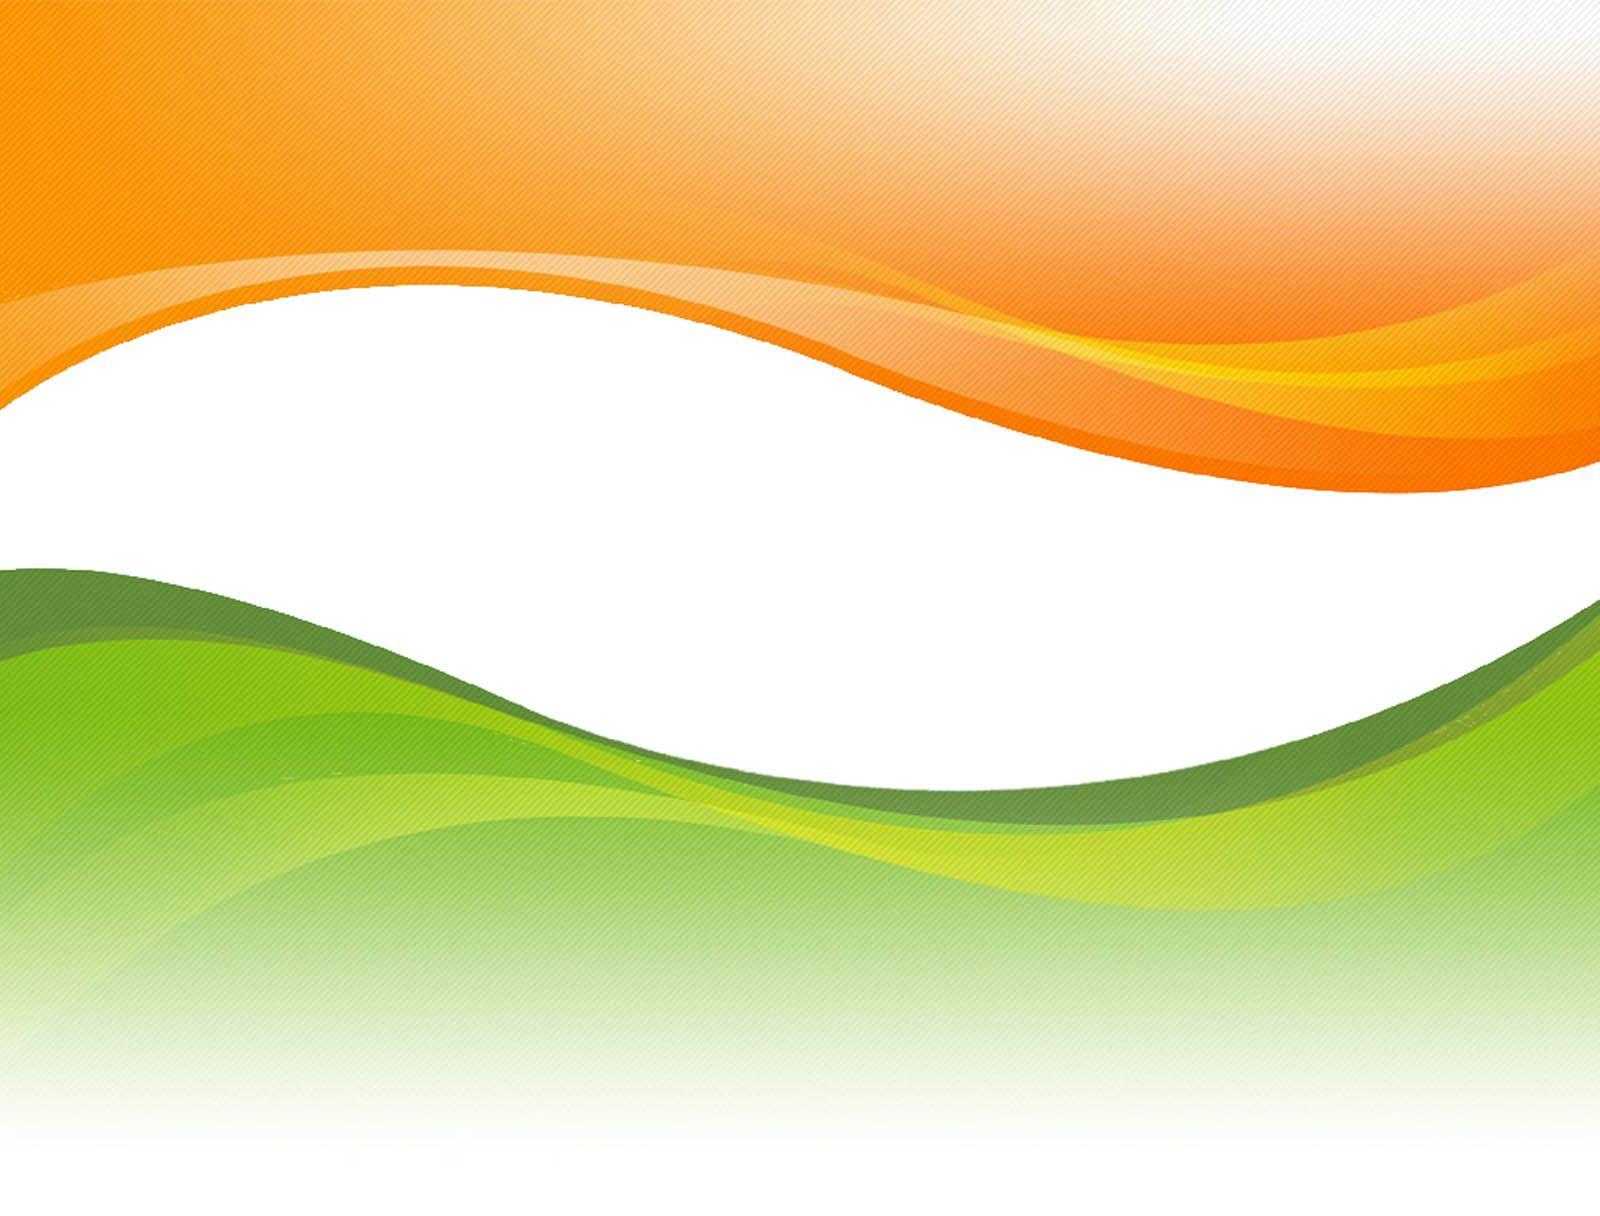 Cool Wallpaper Indian Flag 2015 Indian Flag Wallpaper Indian Flag Indian Flag Colors